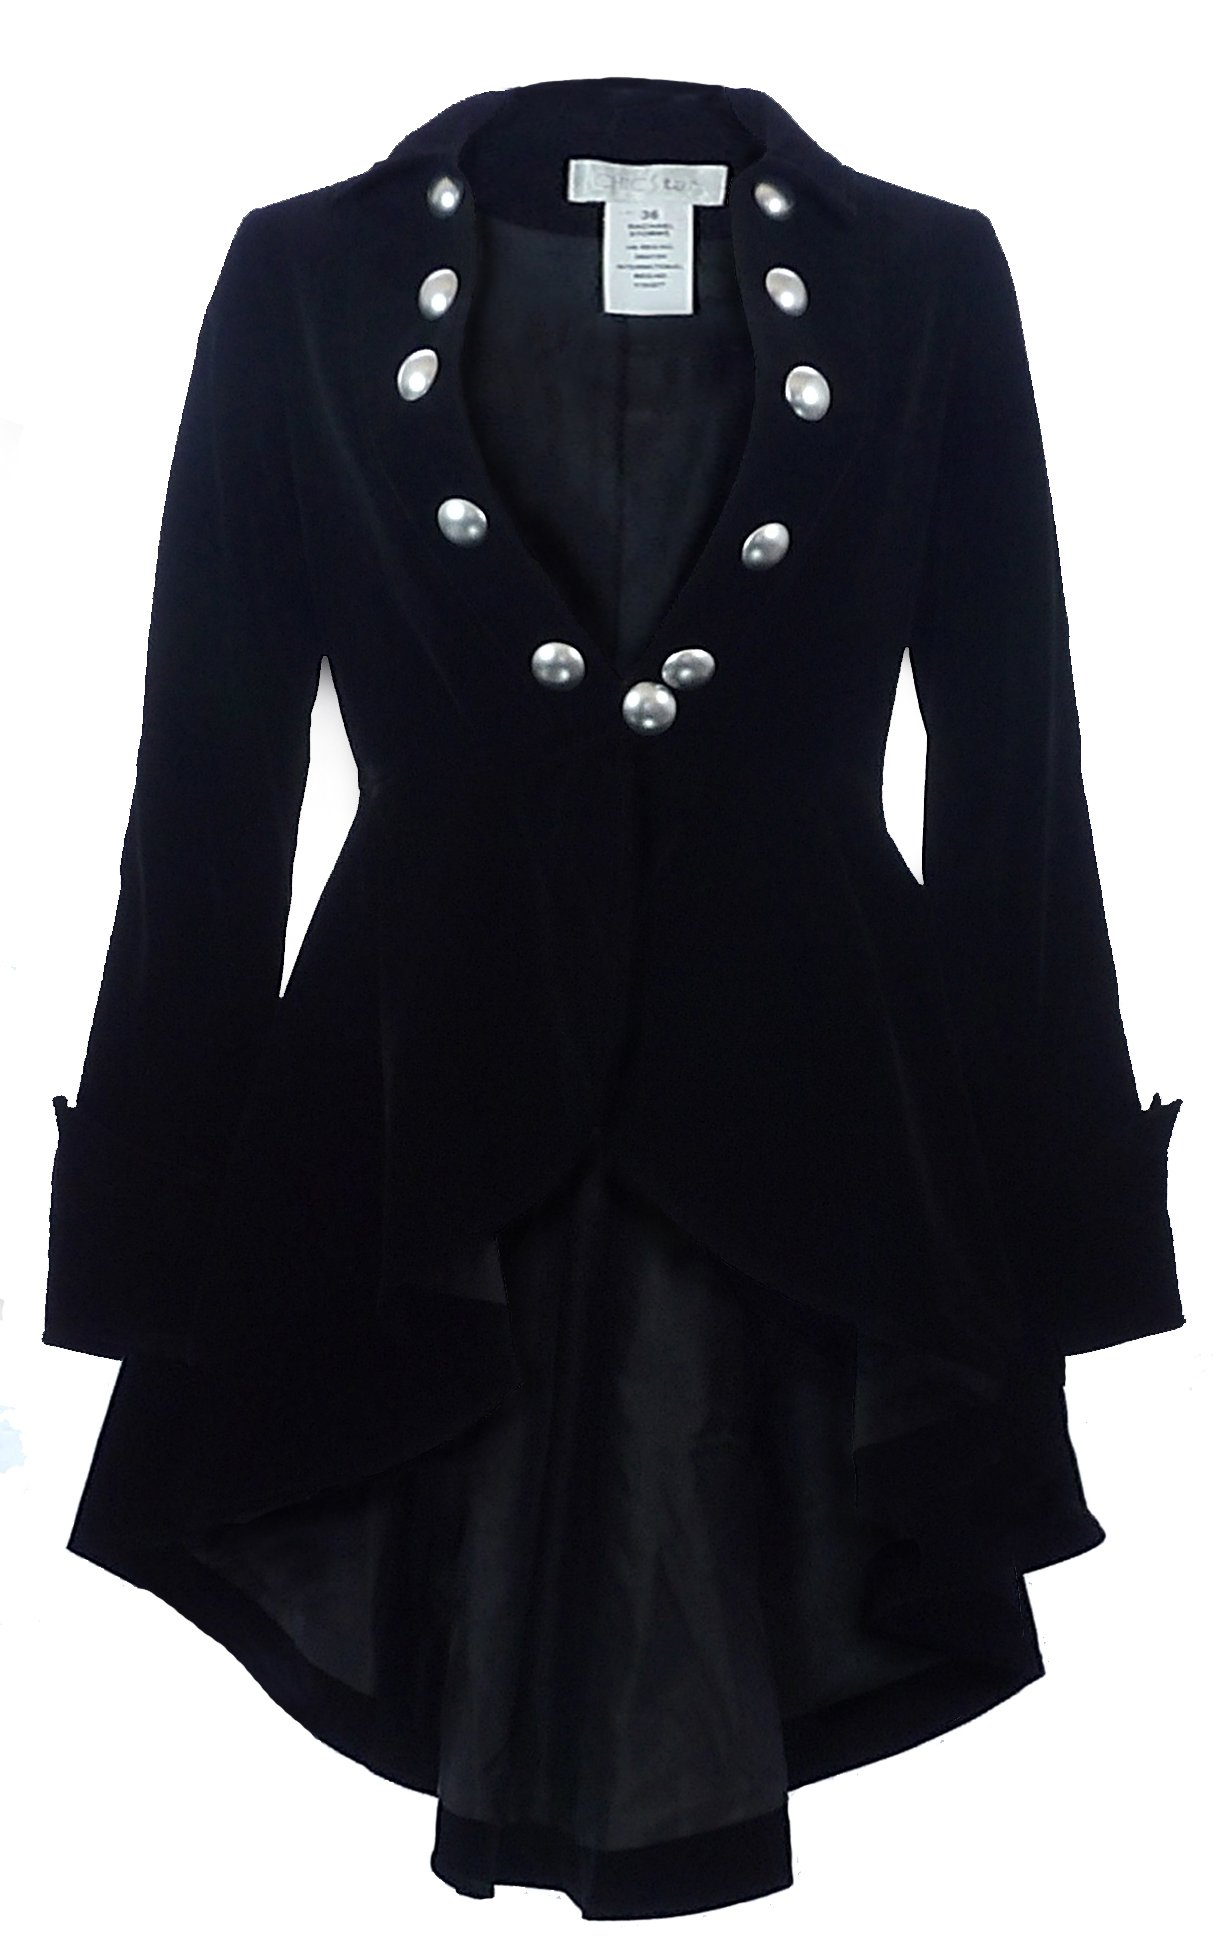 CSDttT (XS-28) Velvet Wine Waterfall - Black Victorian Gothic Ruffle High-Low Vintage Style Jacket (XXL)